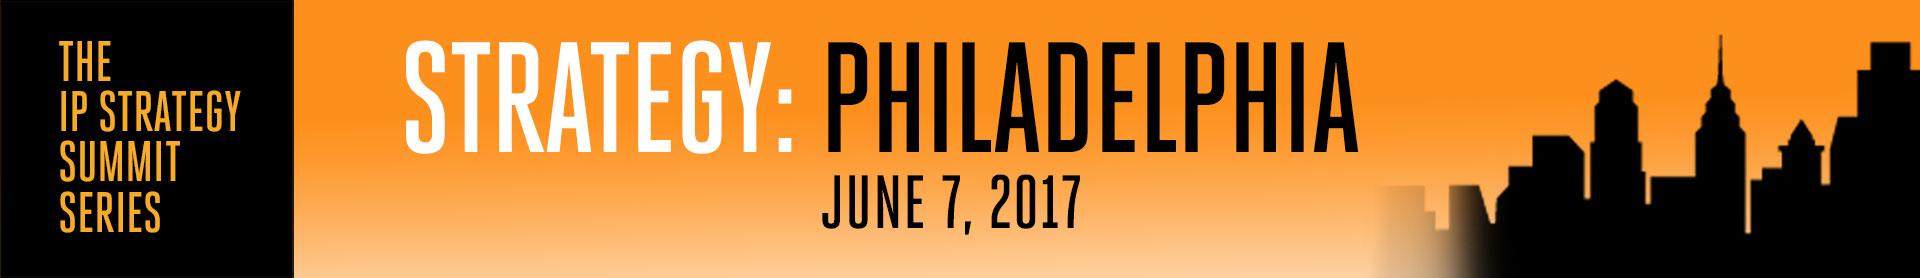 The IP  Strategy Summit: Philadelphia